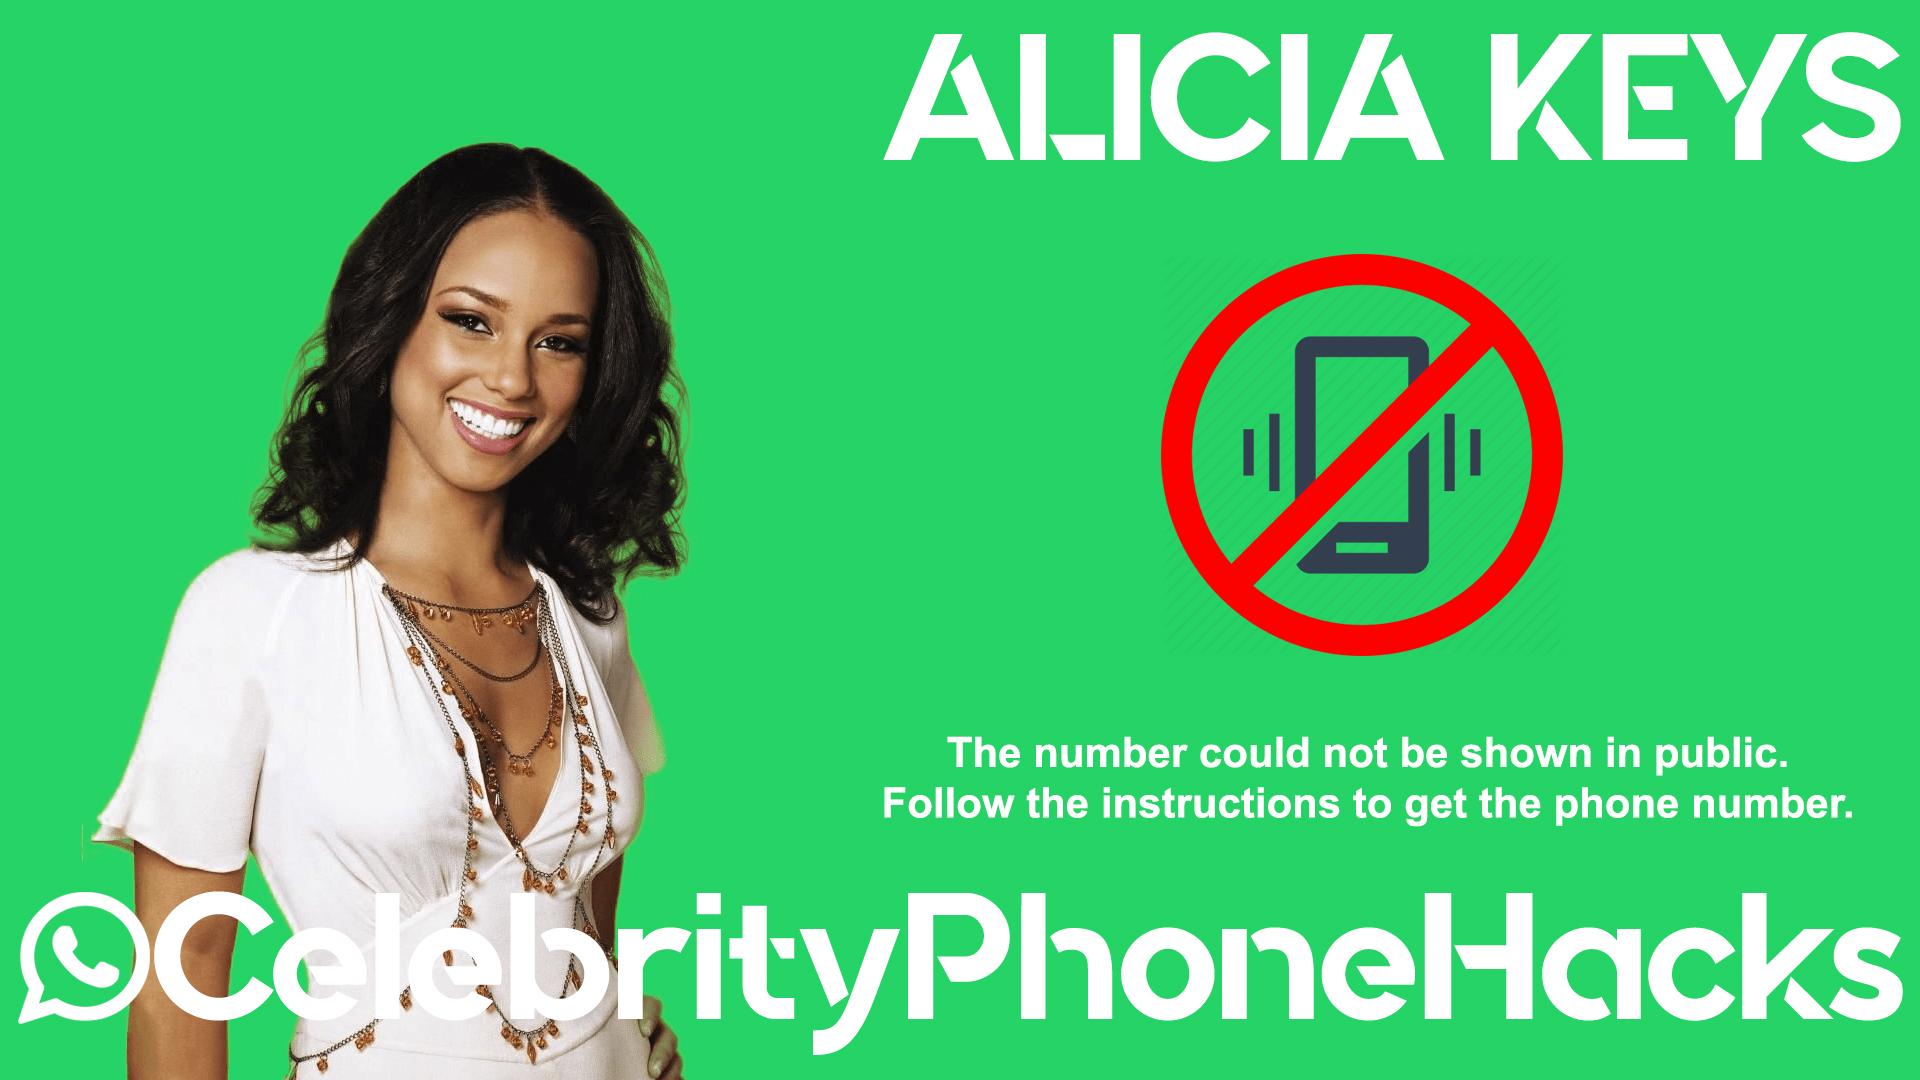 Alicia Keys real phone number 2019 whatsapp hacked leaked